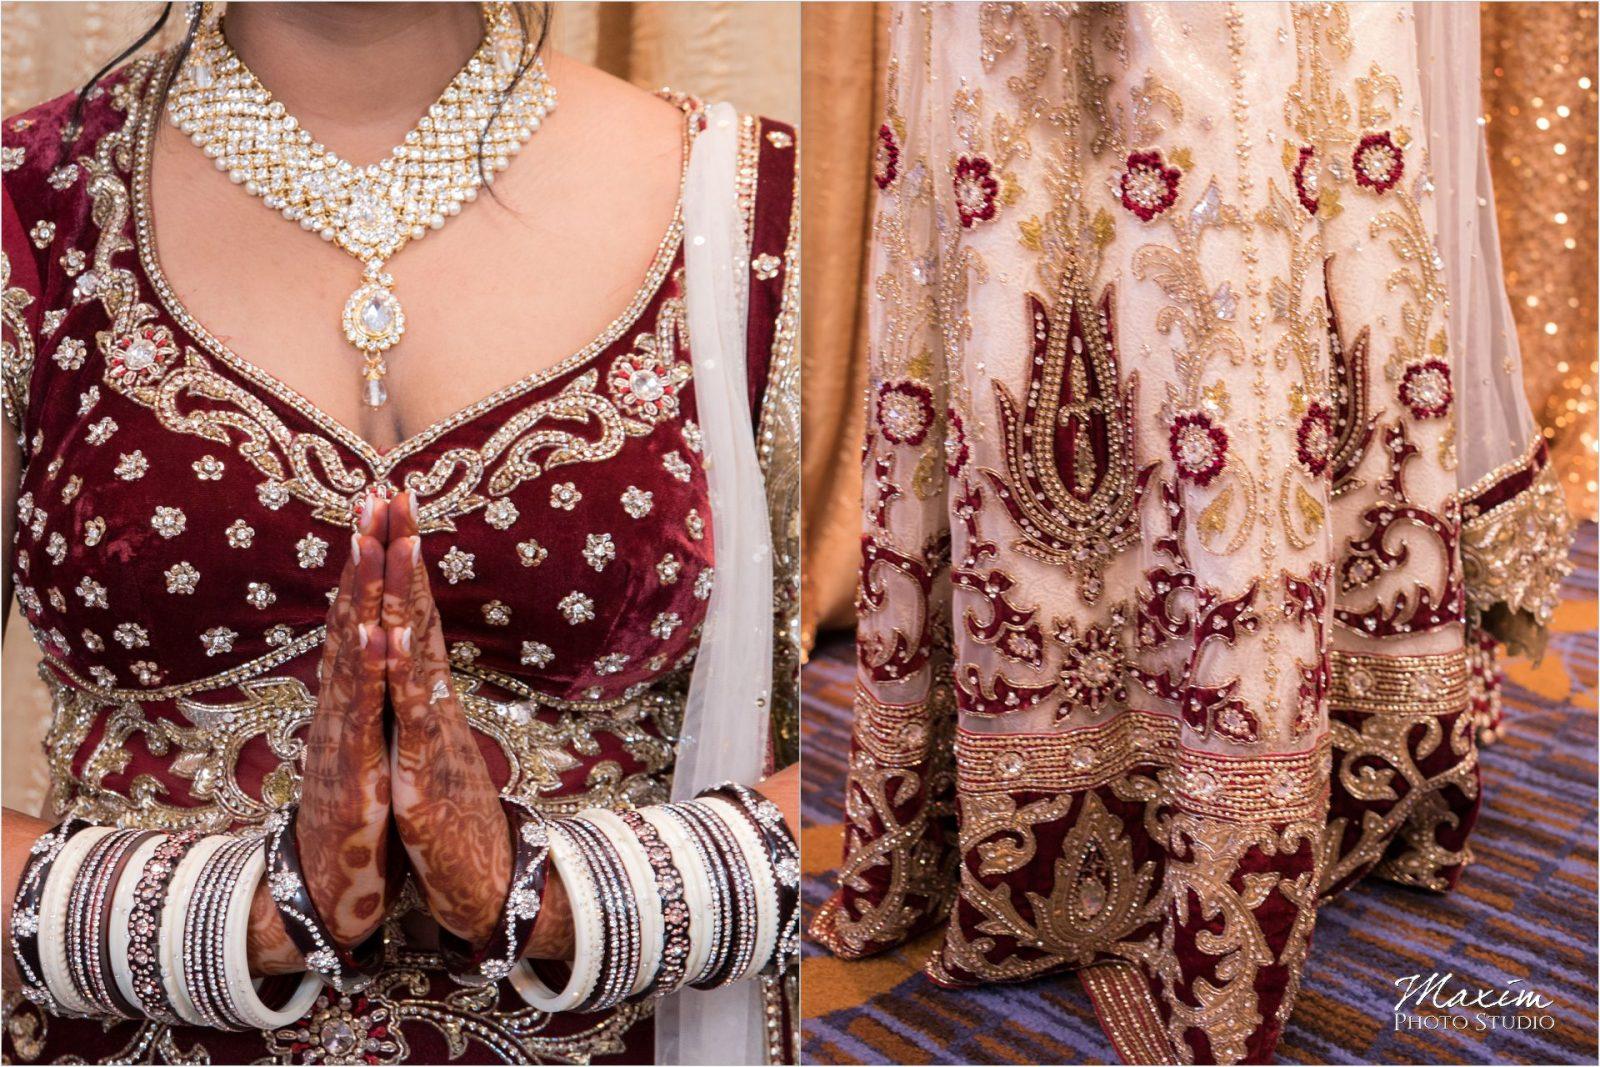 Savannah Center Indian Wedding Bride Preparations